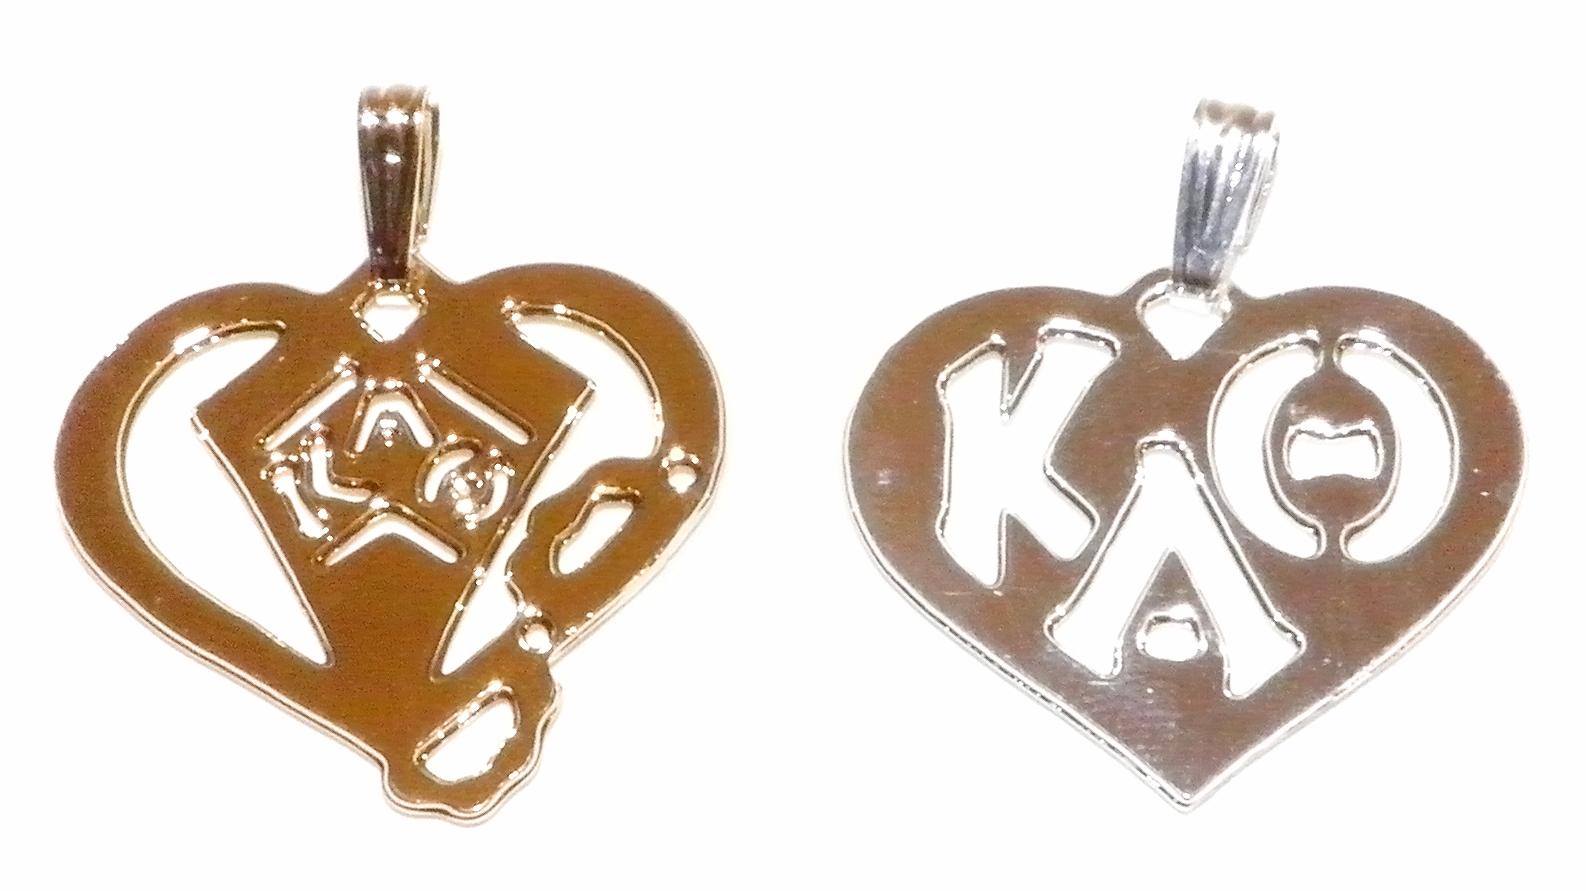 Kappa Alpha Theta pendants